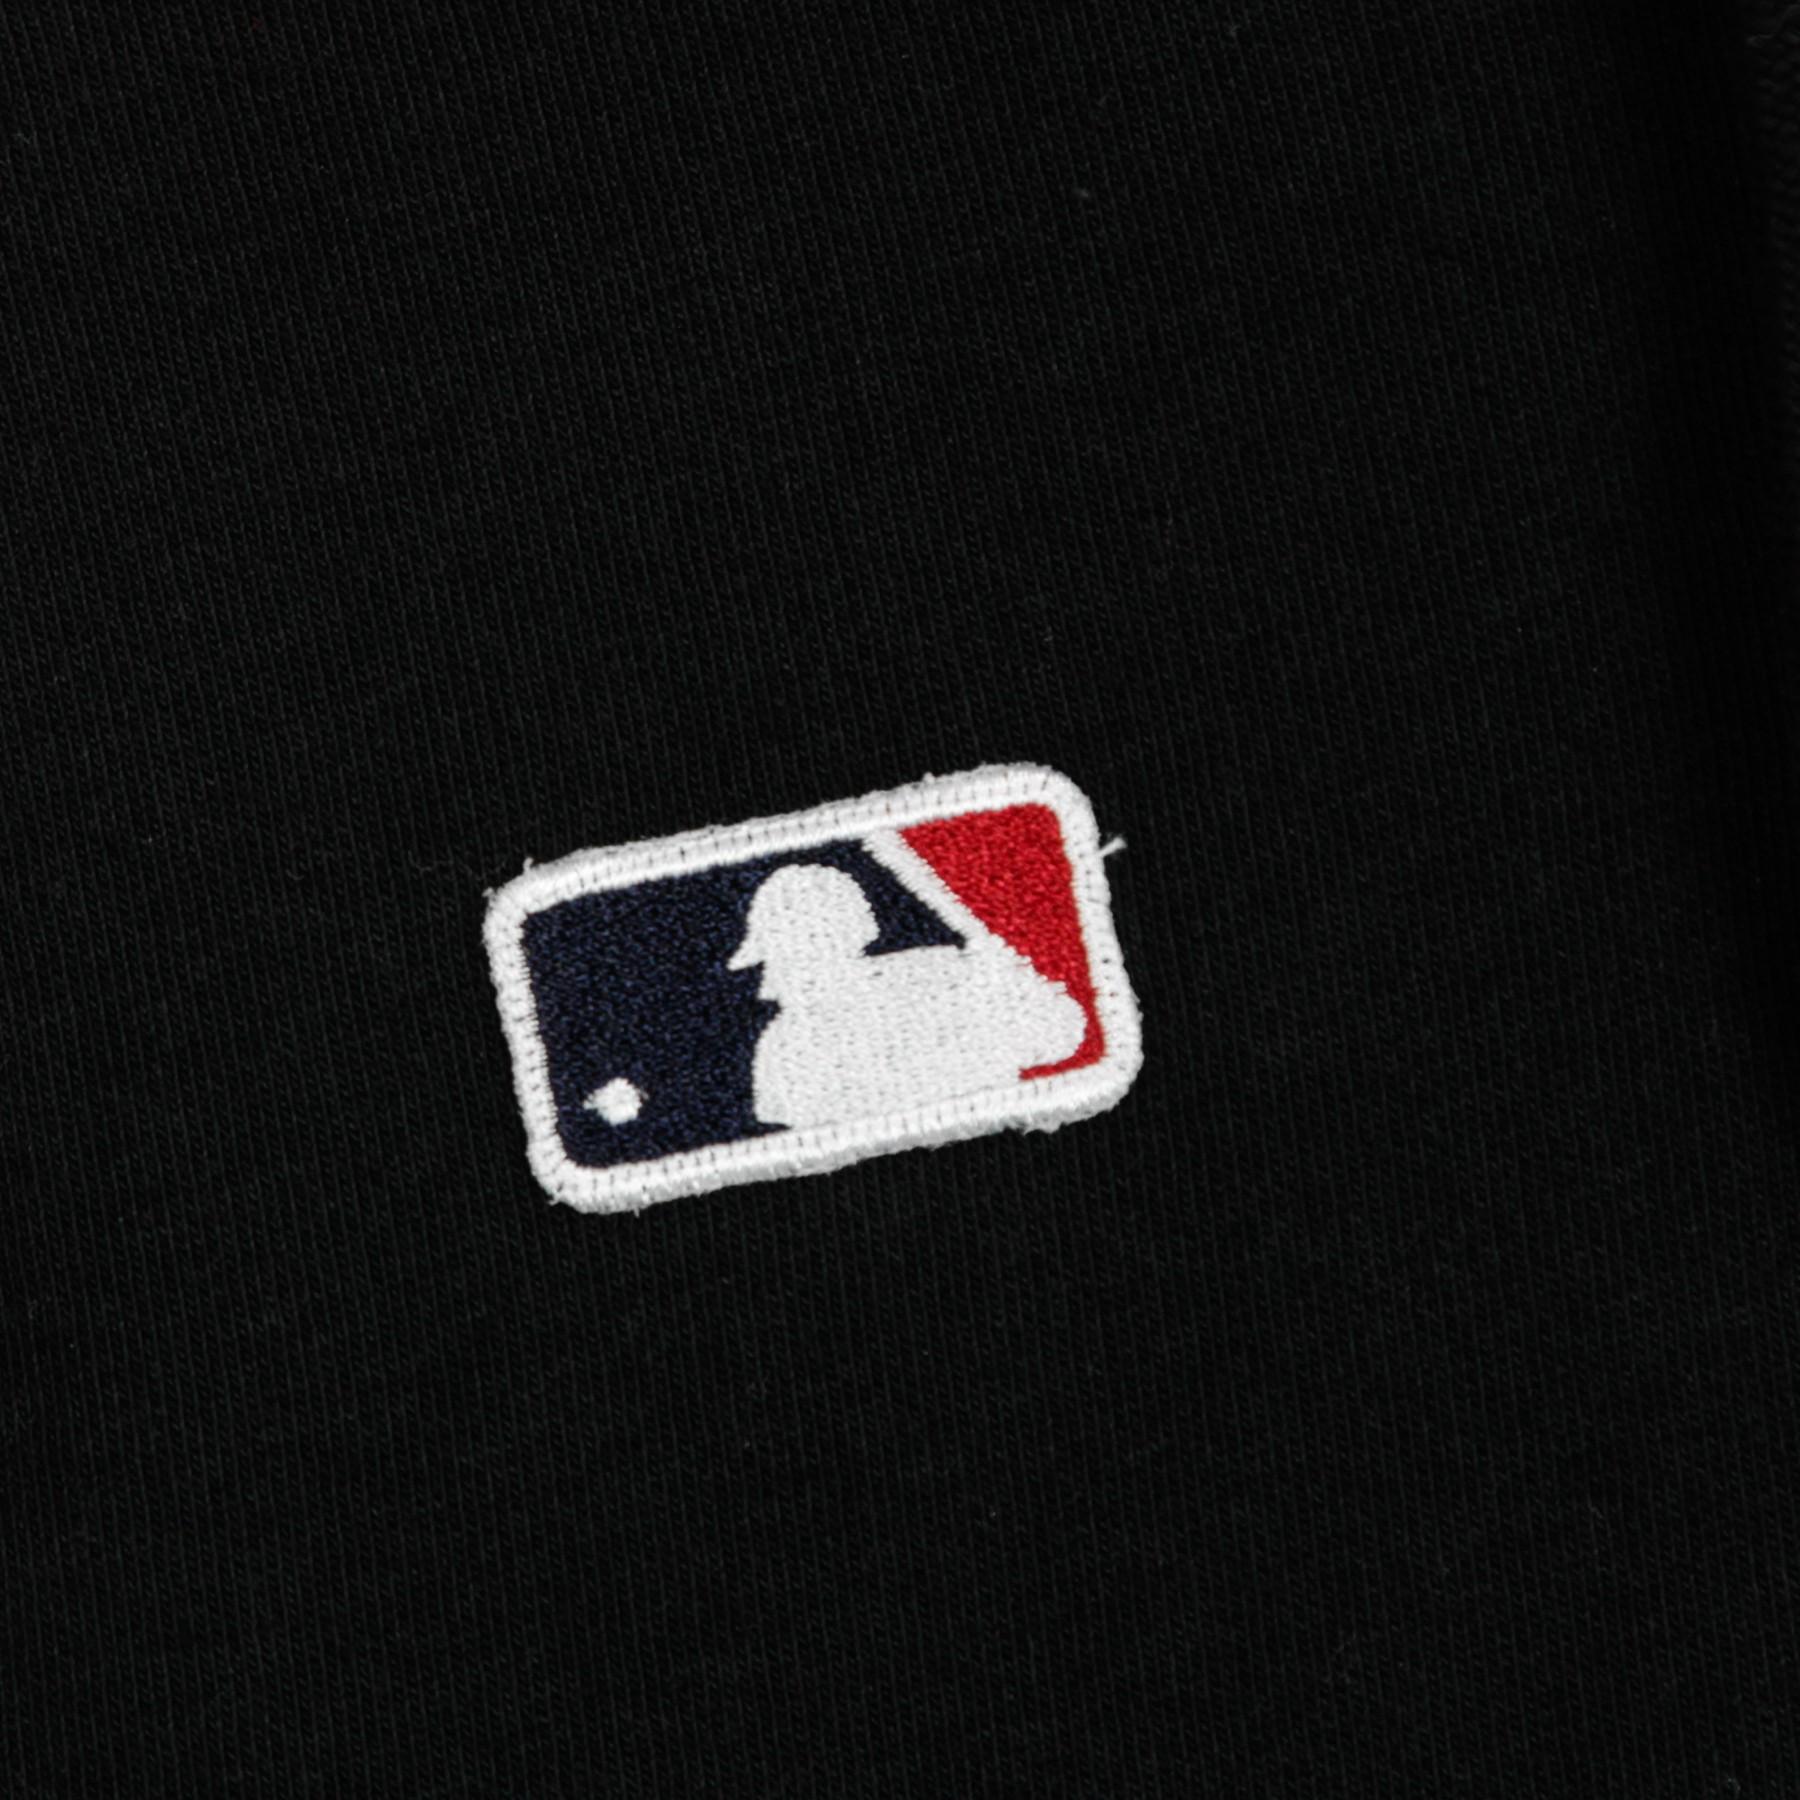 FELPA CAPPUCCIO MLB TRILOGY HEADLINE HOOD LOSDOD